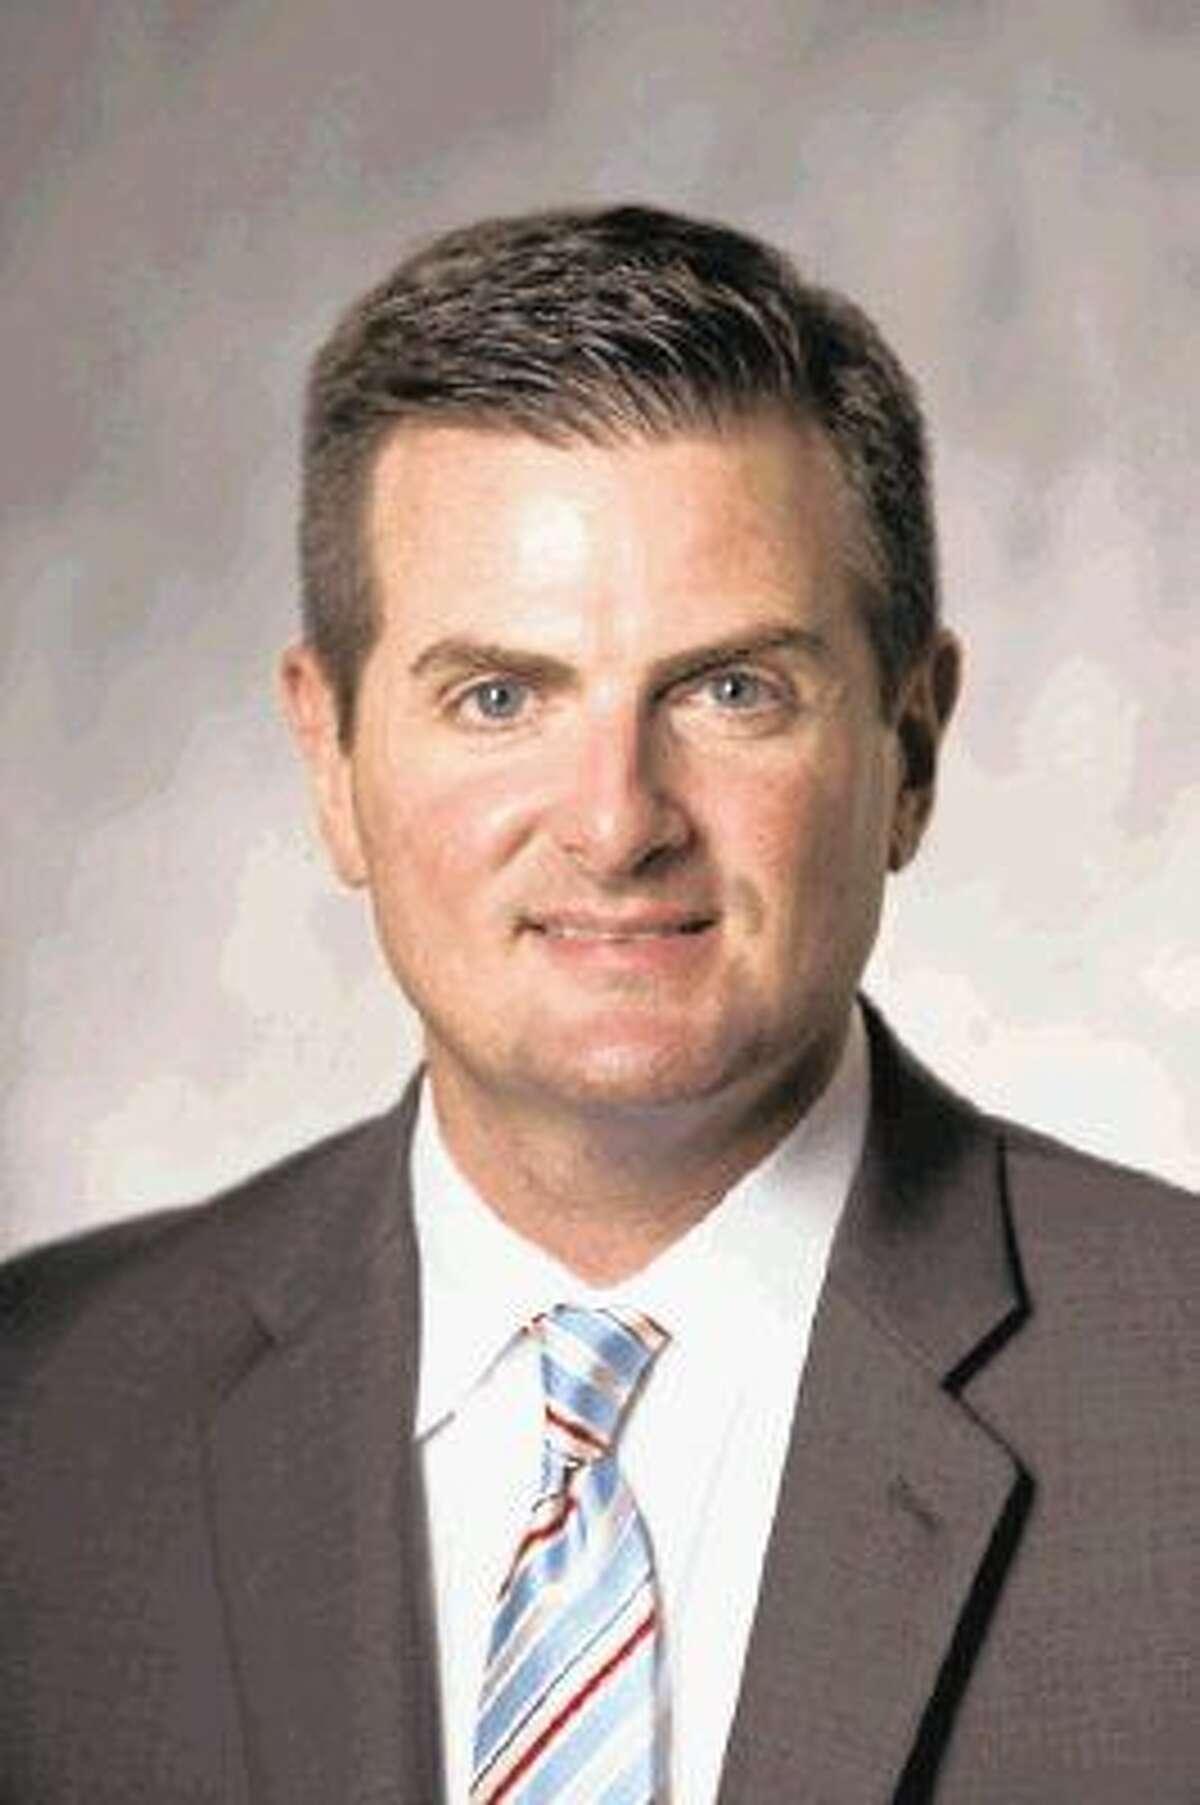 Brandon Creighton